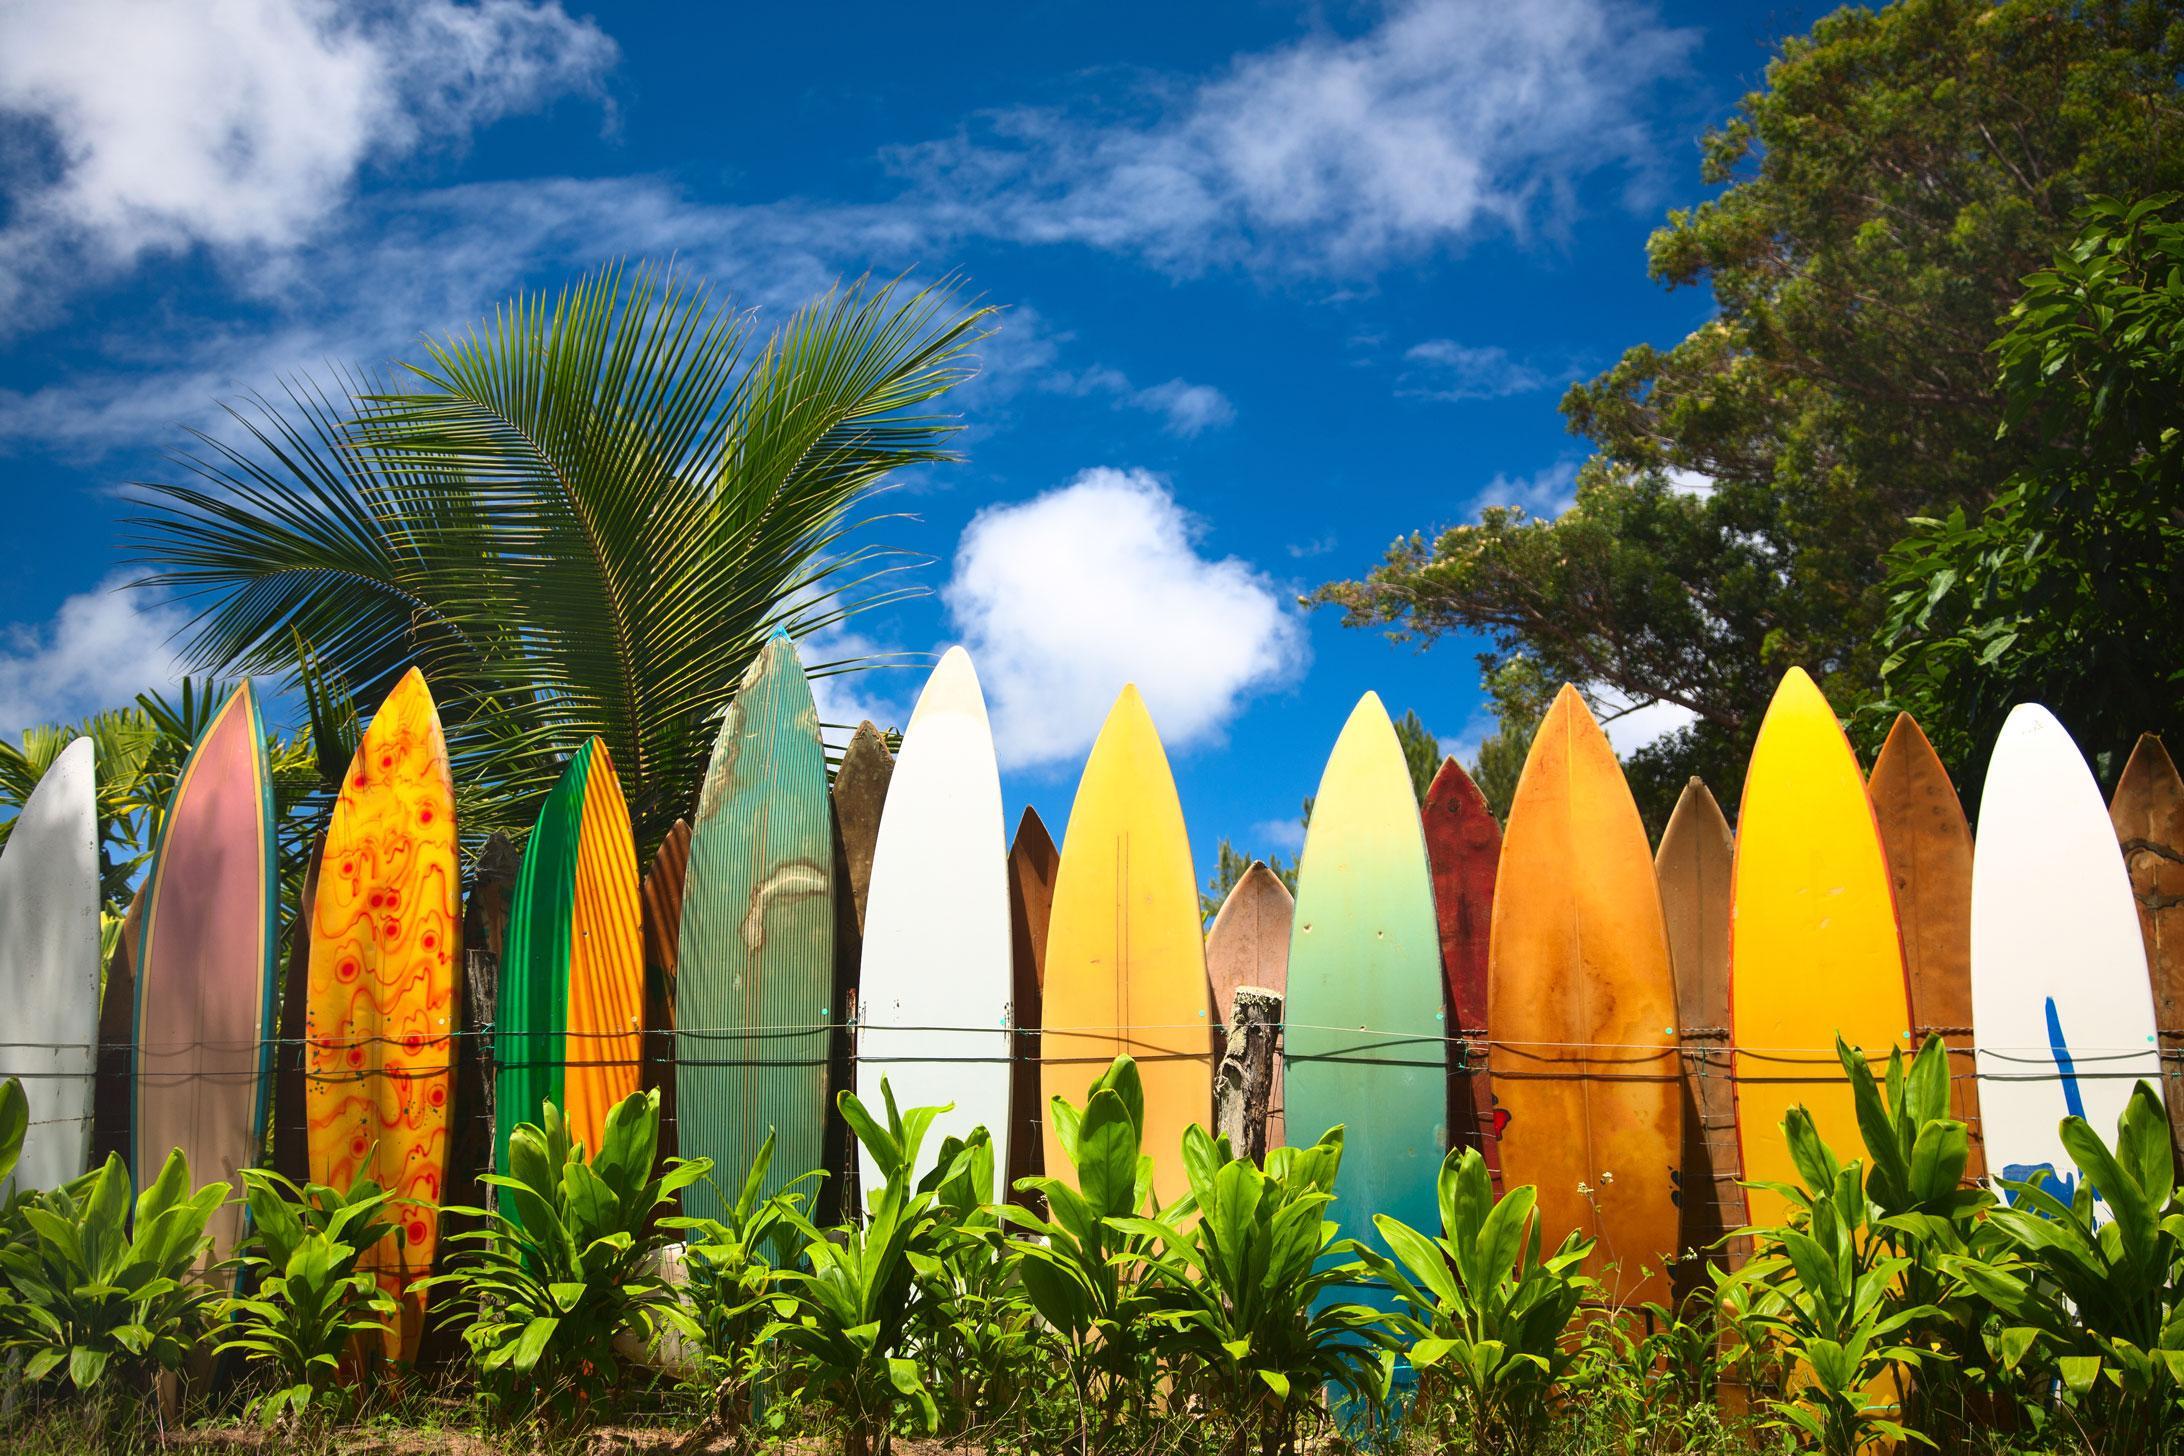 Aarp Travel Deals To Hawaii Lamoureph Blog